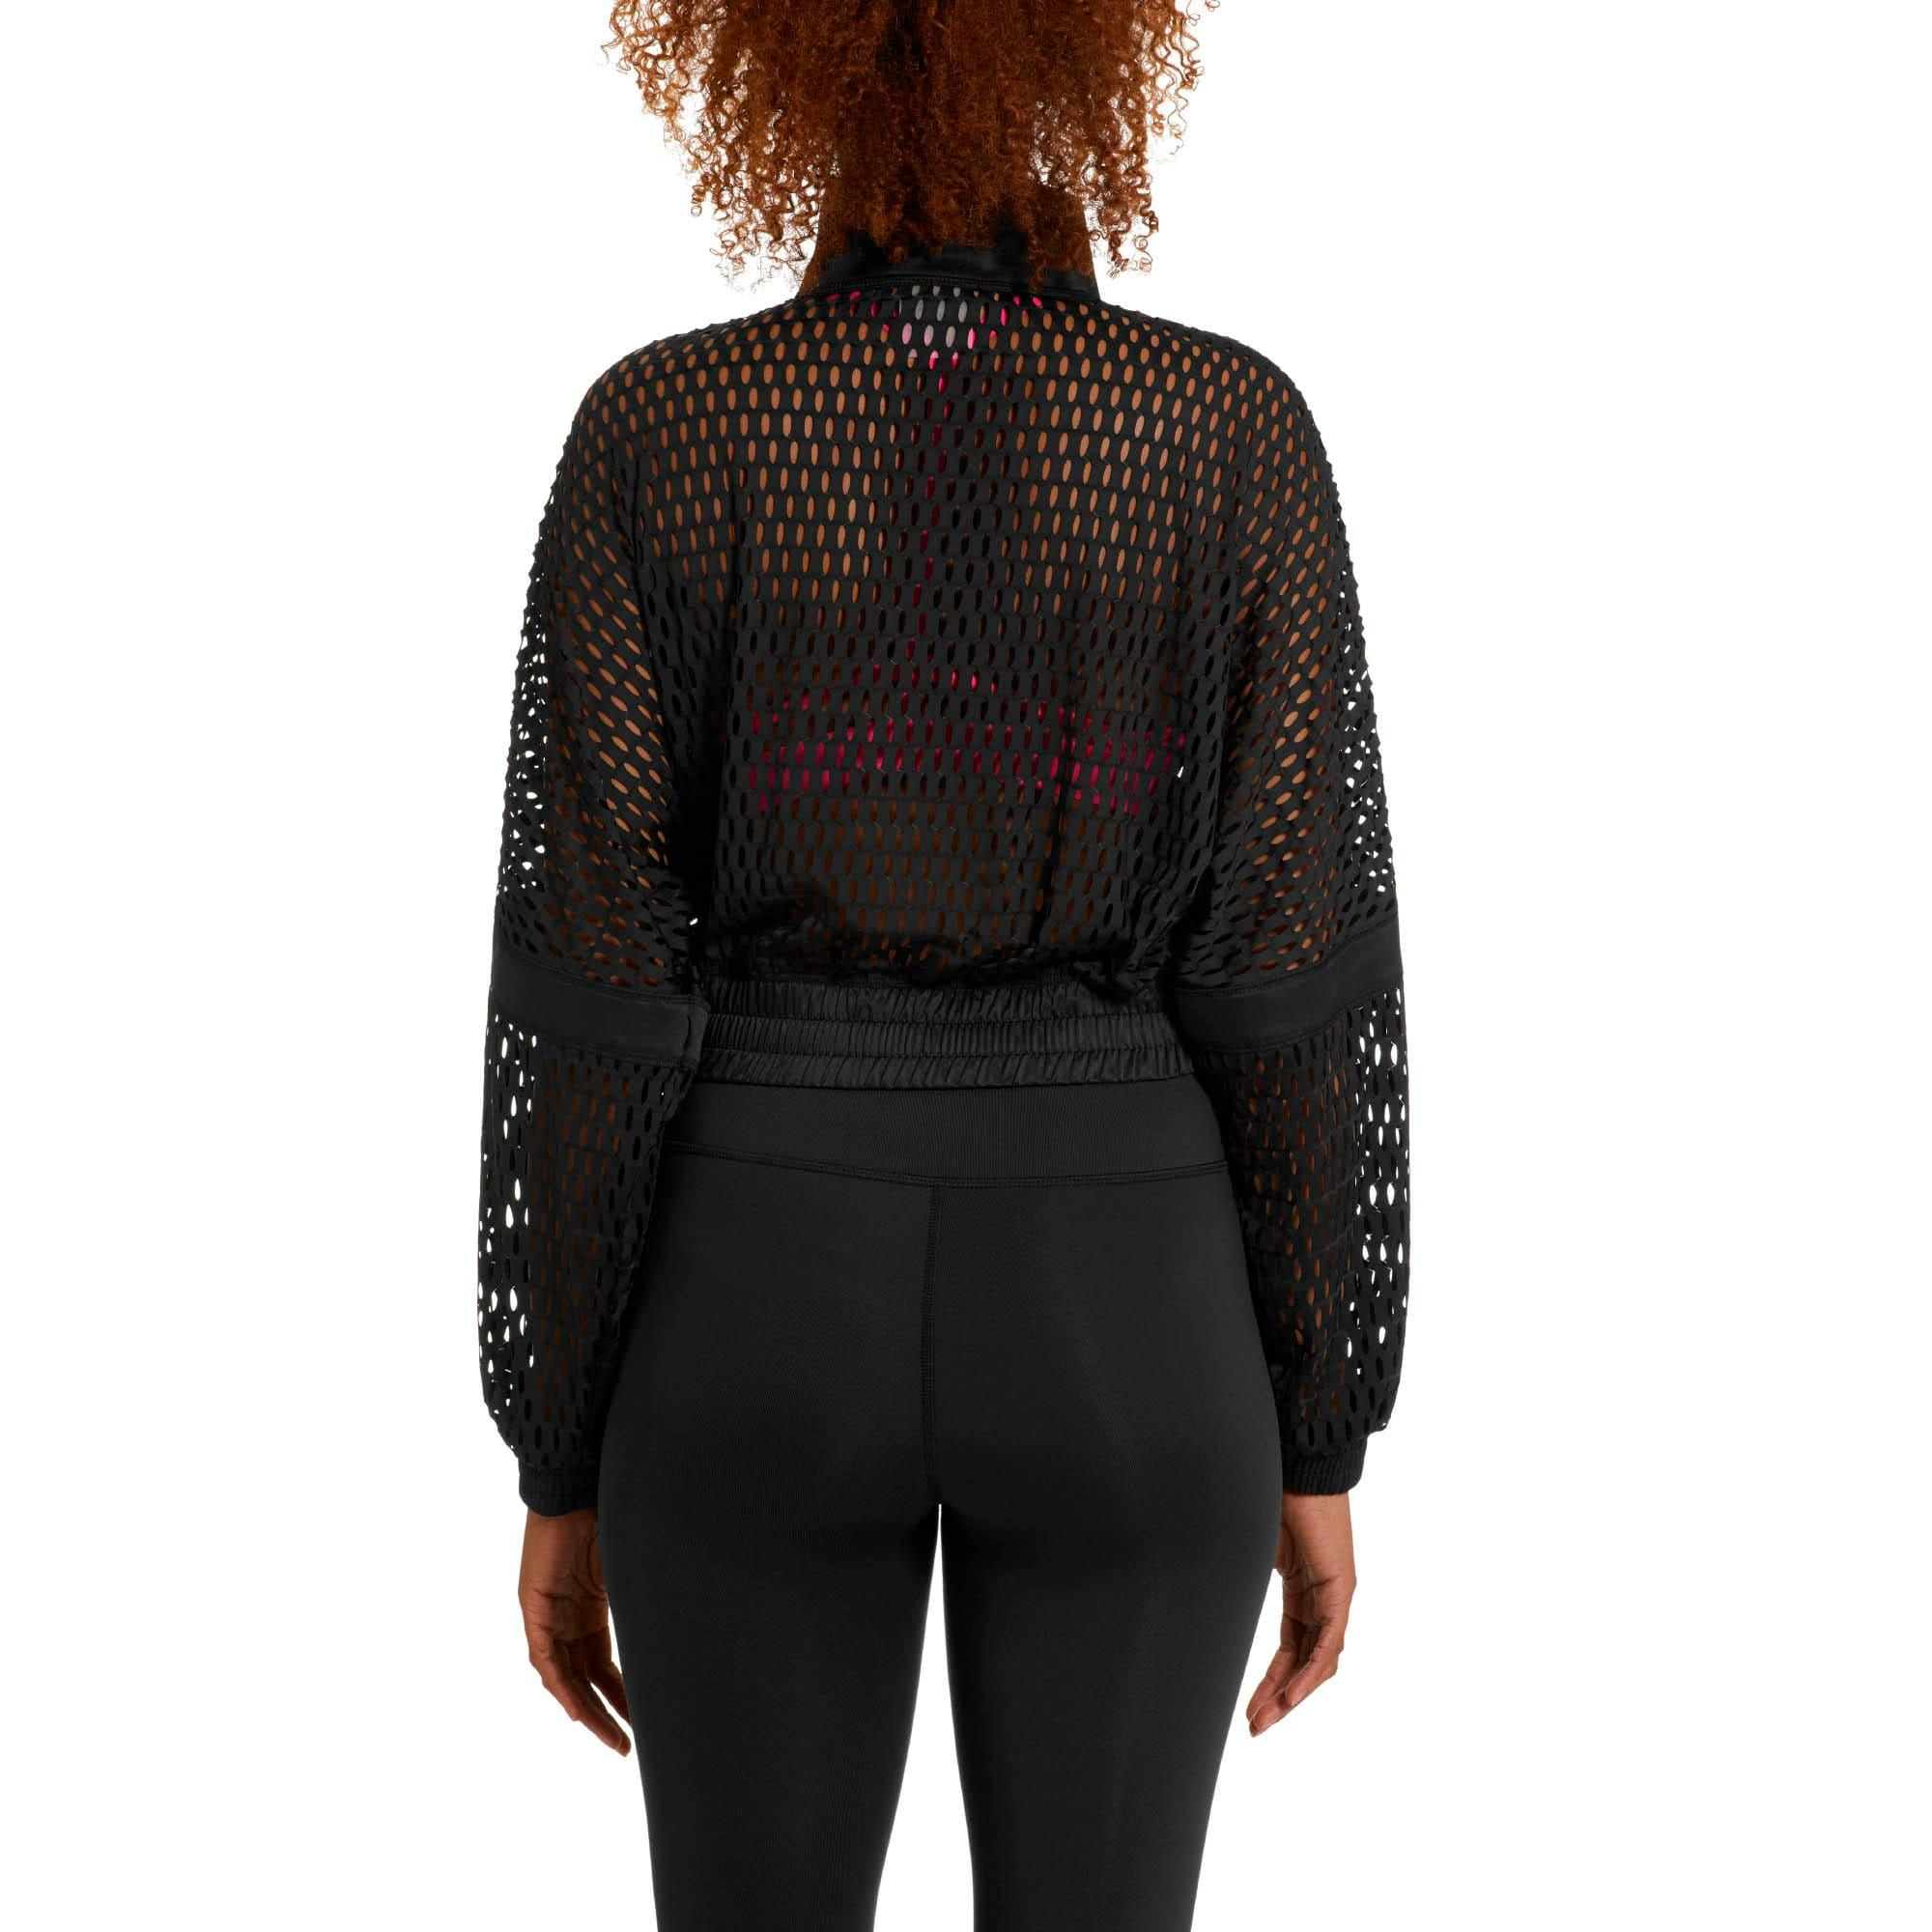 Thumbnail 2 of On the Brink Women's Knit Jacket, Puma Black, medium